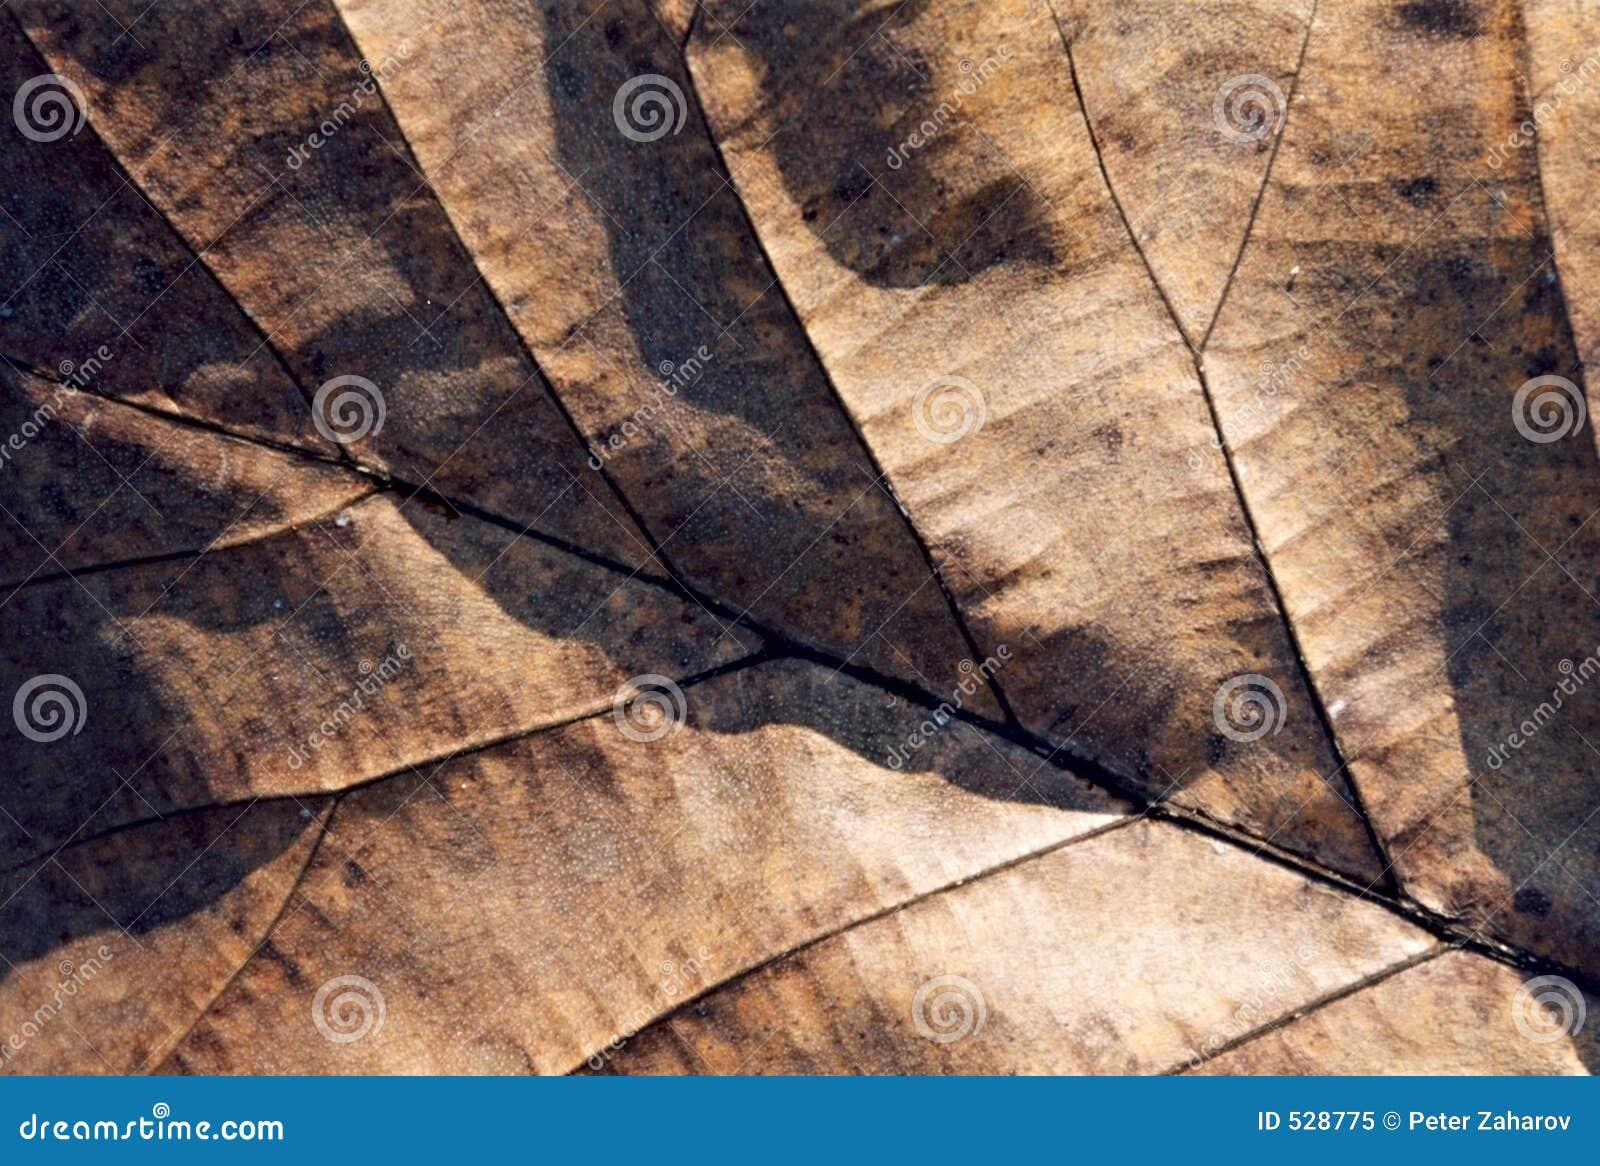 Download 干燥叶子 库存图片. 图片 包括有 严格, 肋骨, 模式, 装饰, 聚会所, 强壮, 宽频, 生叶, 温和派 - 528775